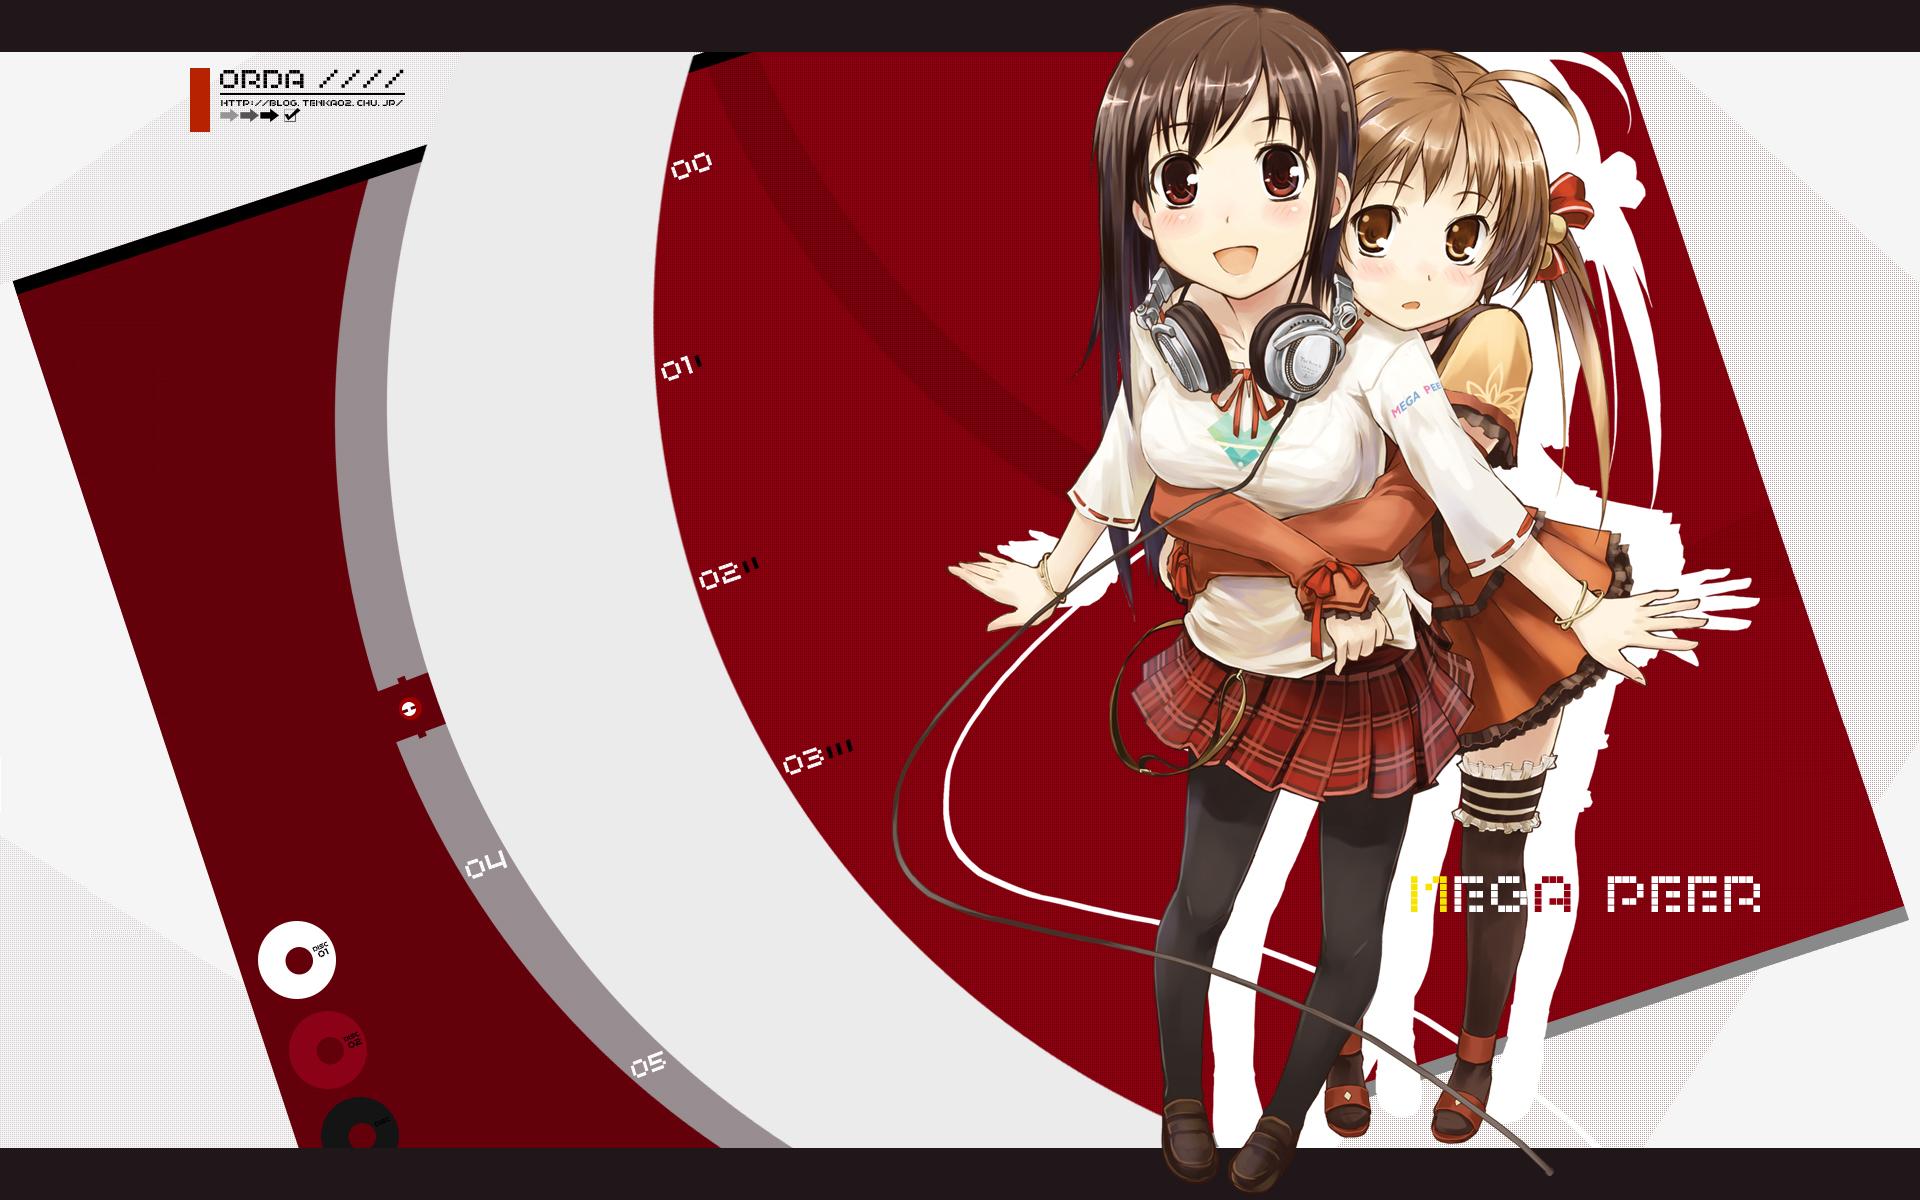 2girls amagai_tarou bow brown_eyes brown_hair headphones hug pantyhose ribbons stockings